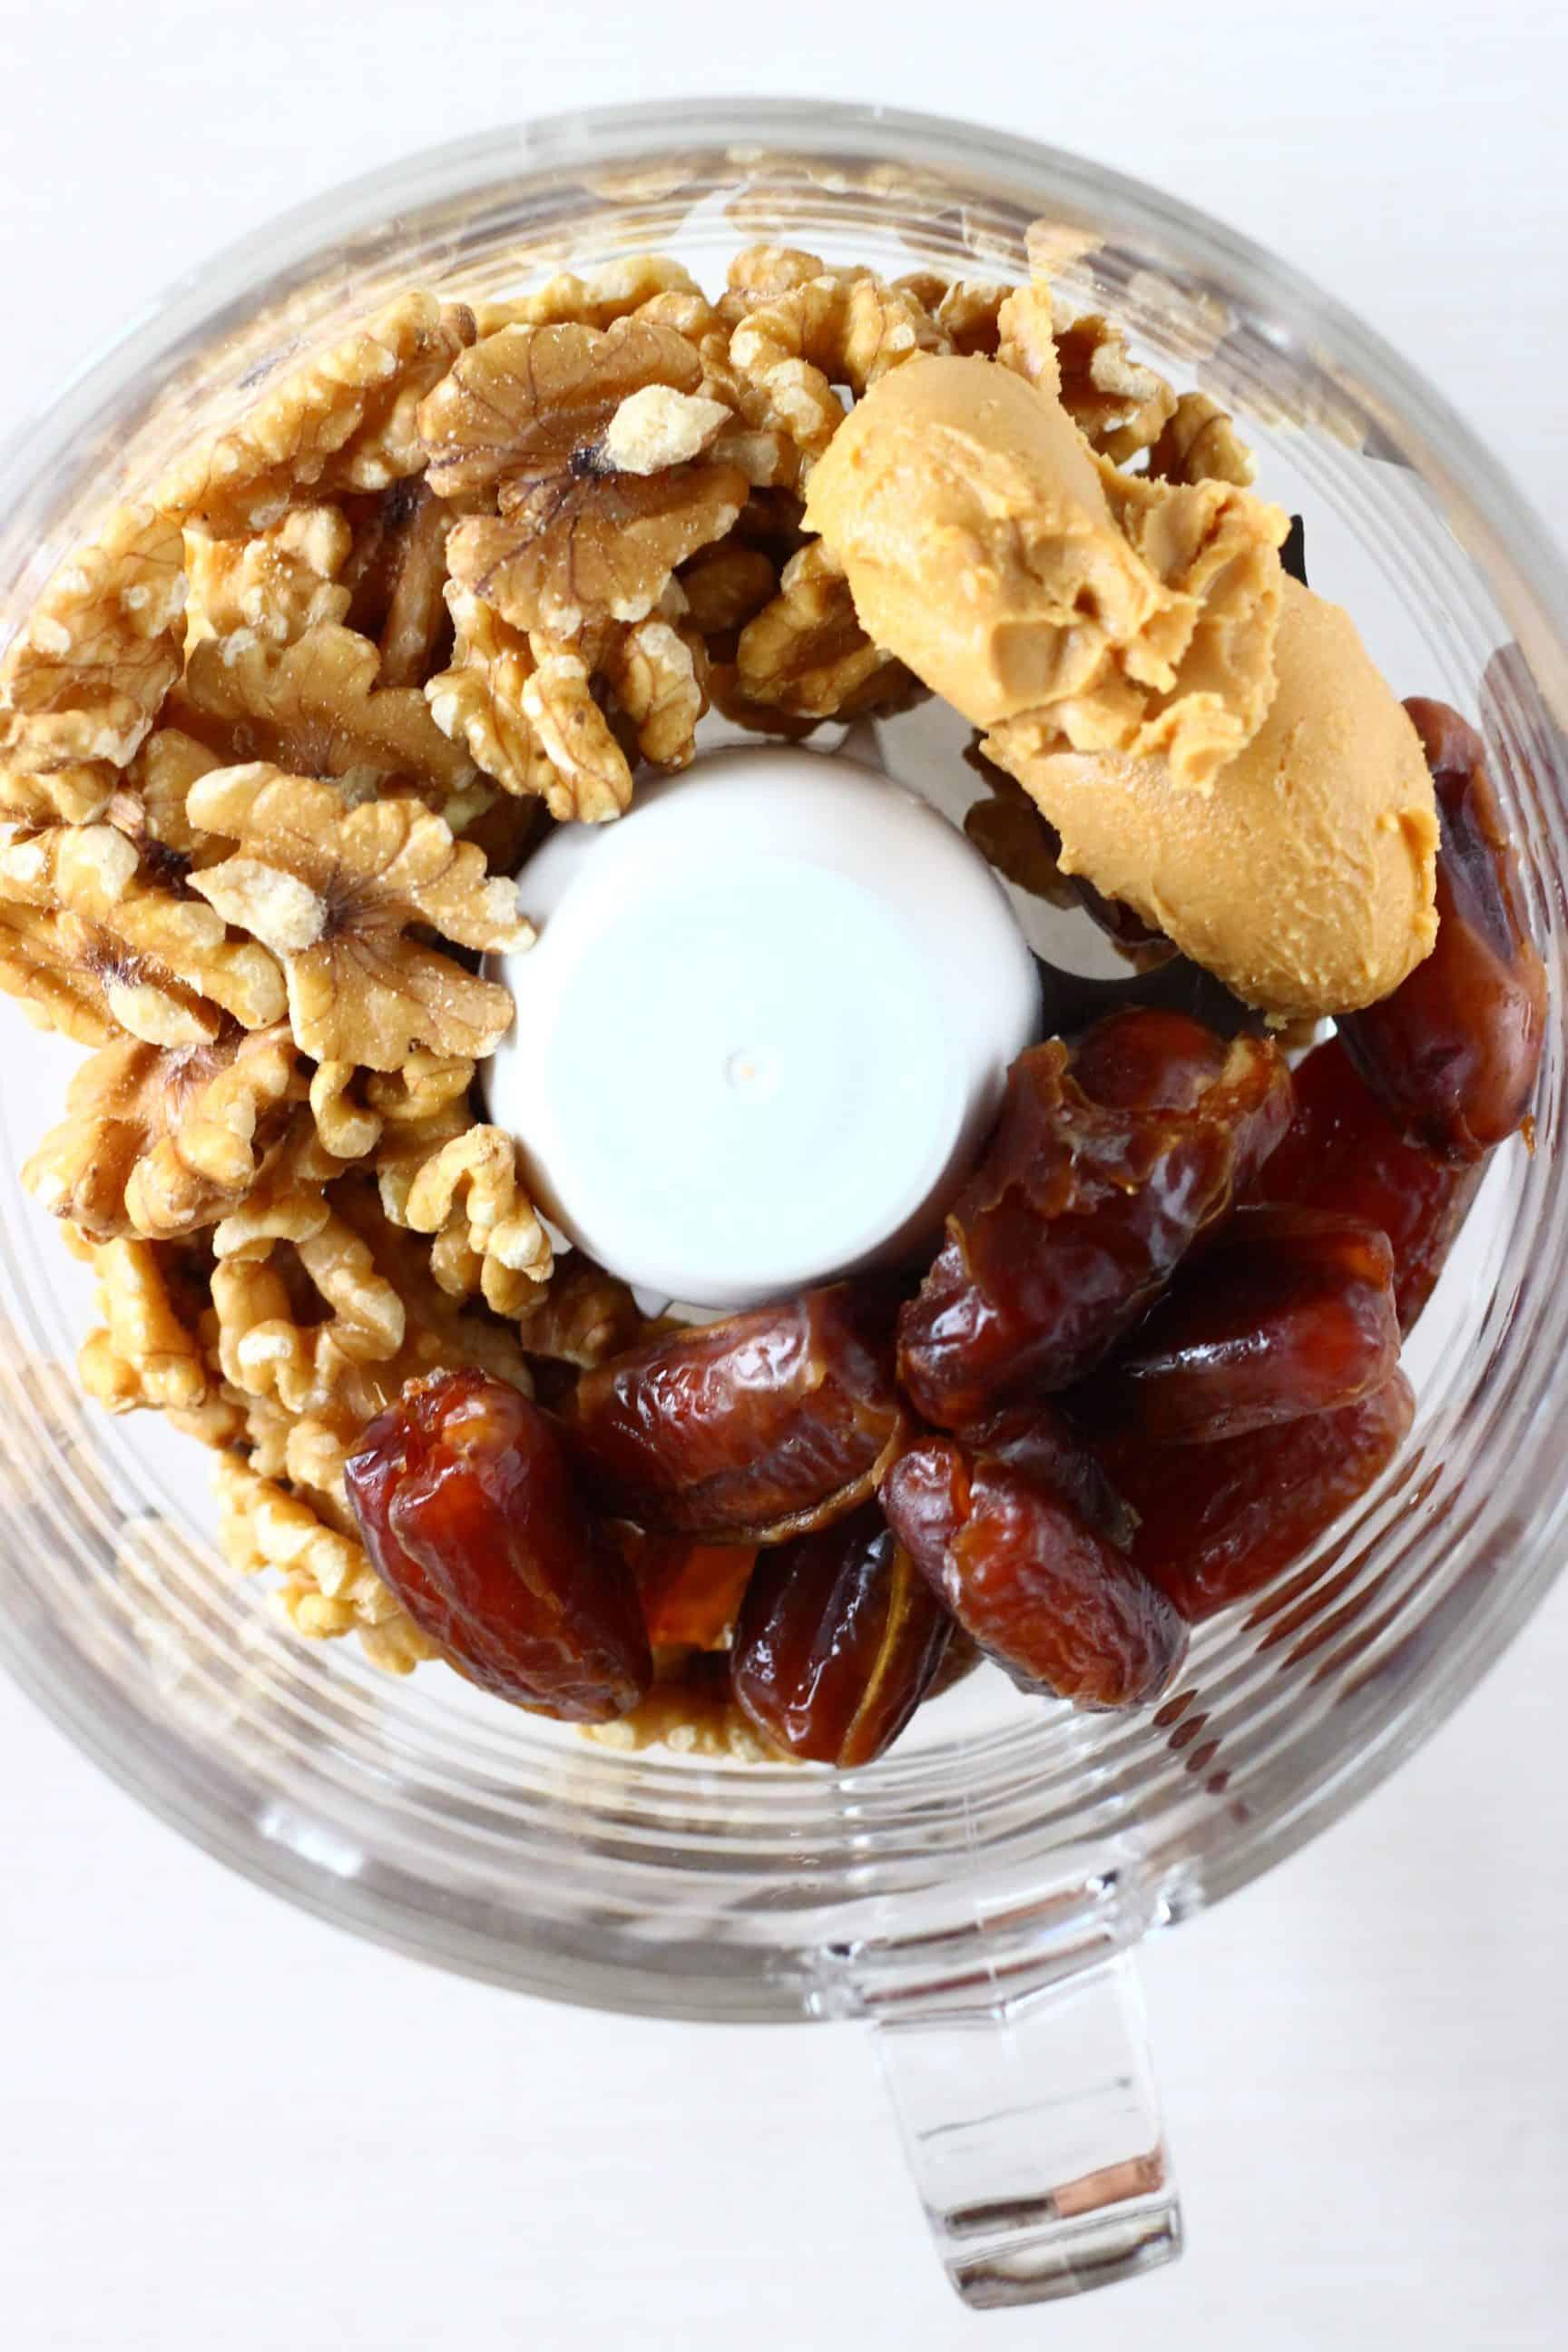 Walnuts, dates and peanut butter in a food processor